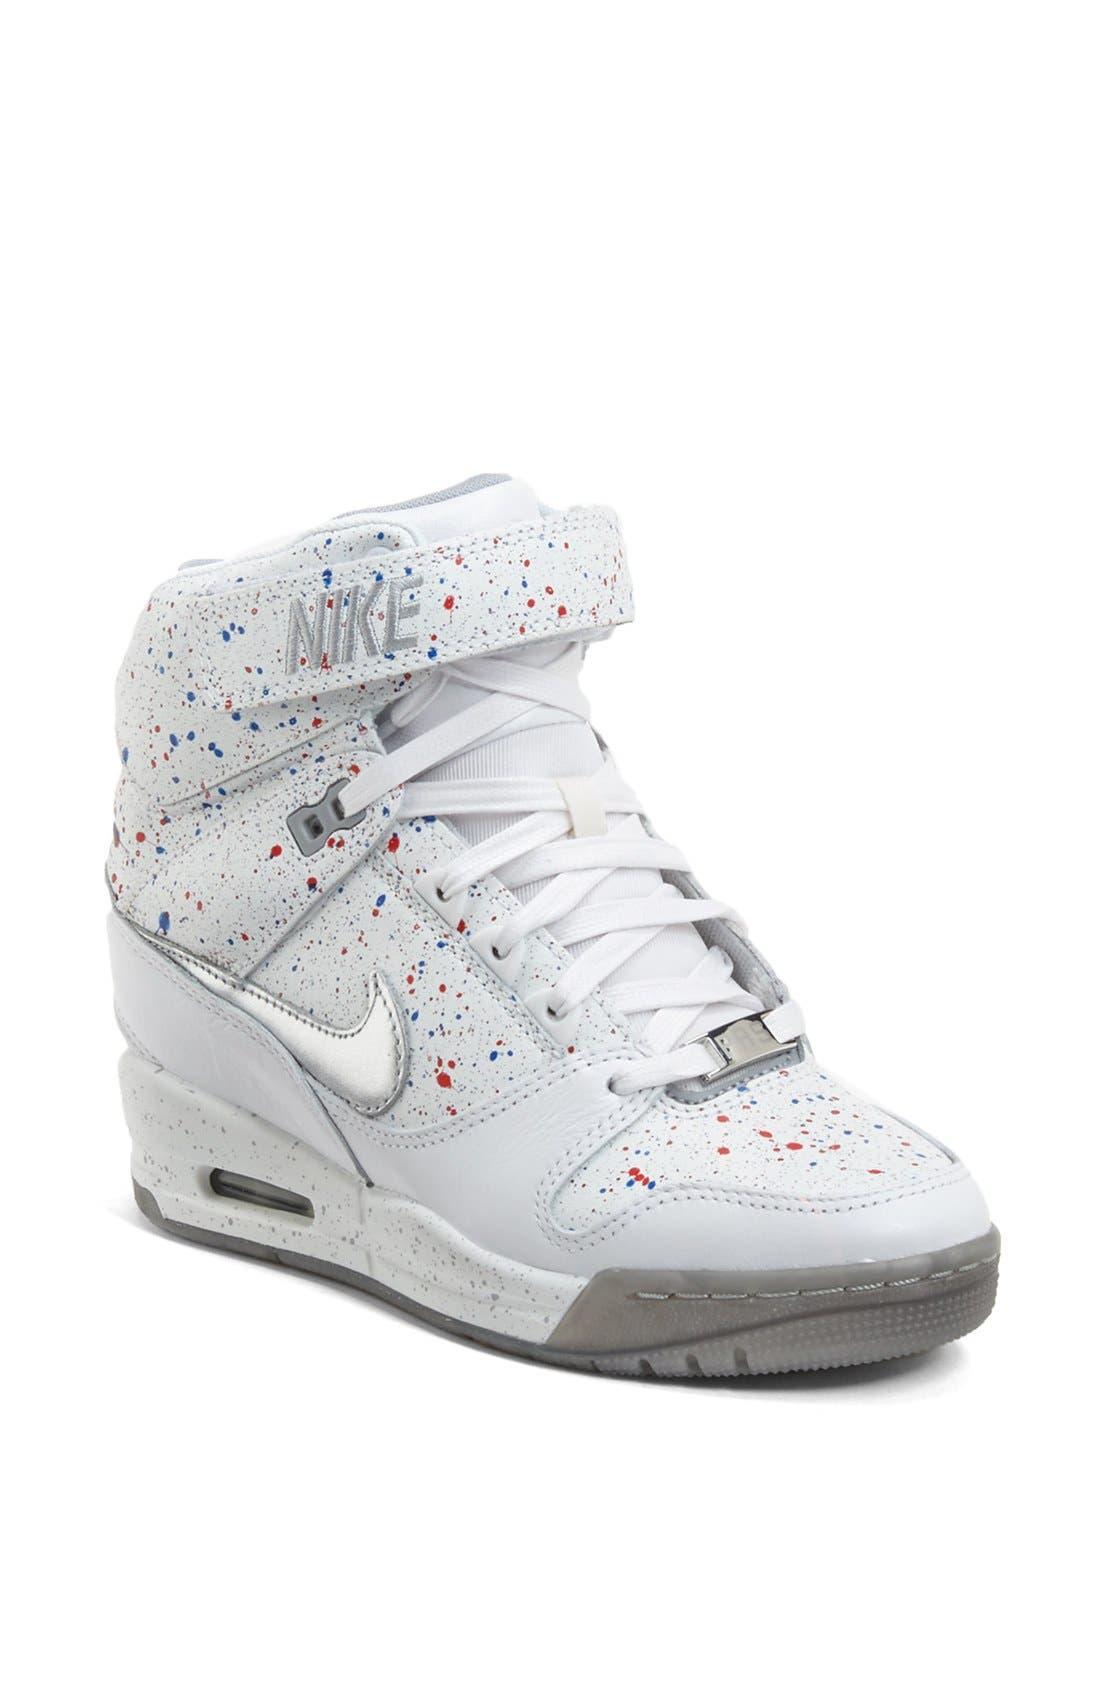 Alternate Image 1 Selected - Nike 'Air Revolution Sky Hi' Hidden Wedge Sneaker (Women)